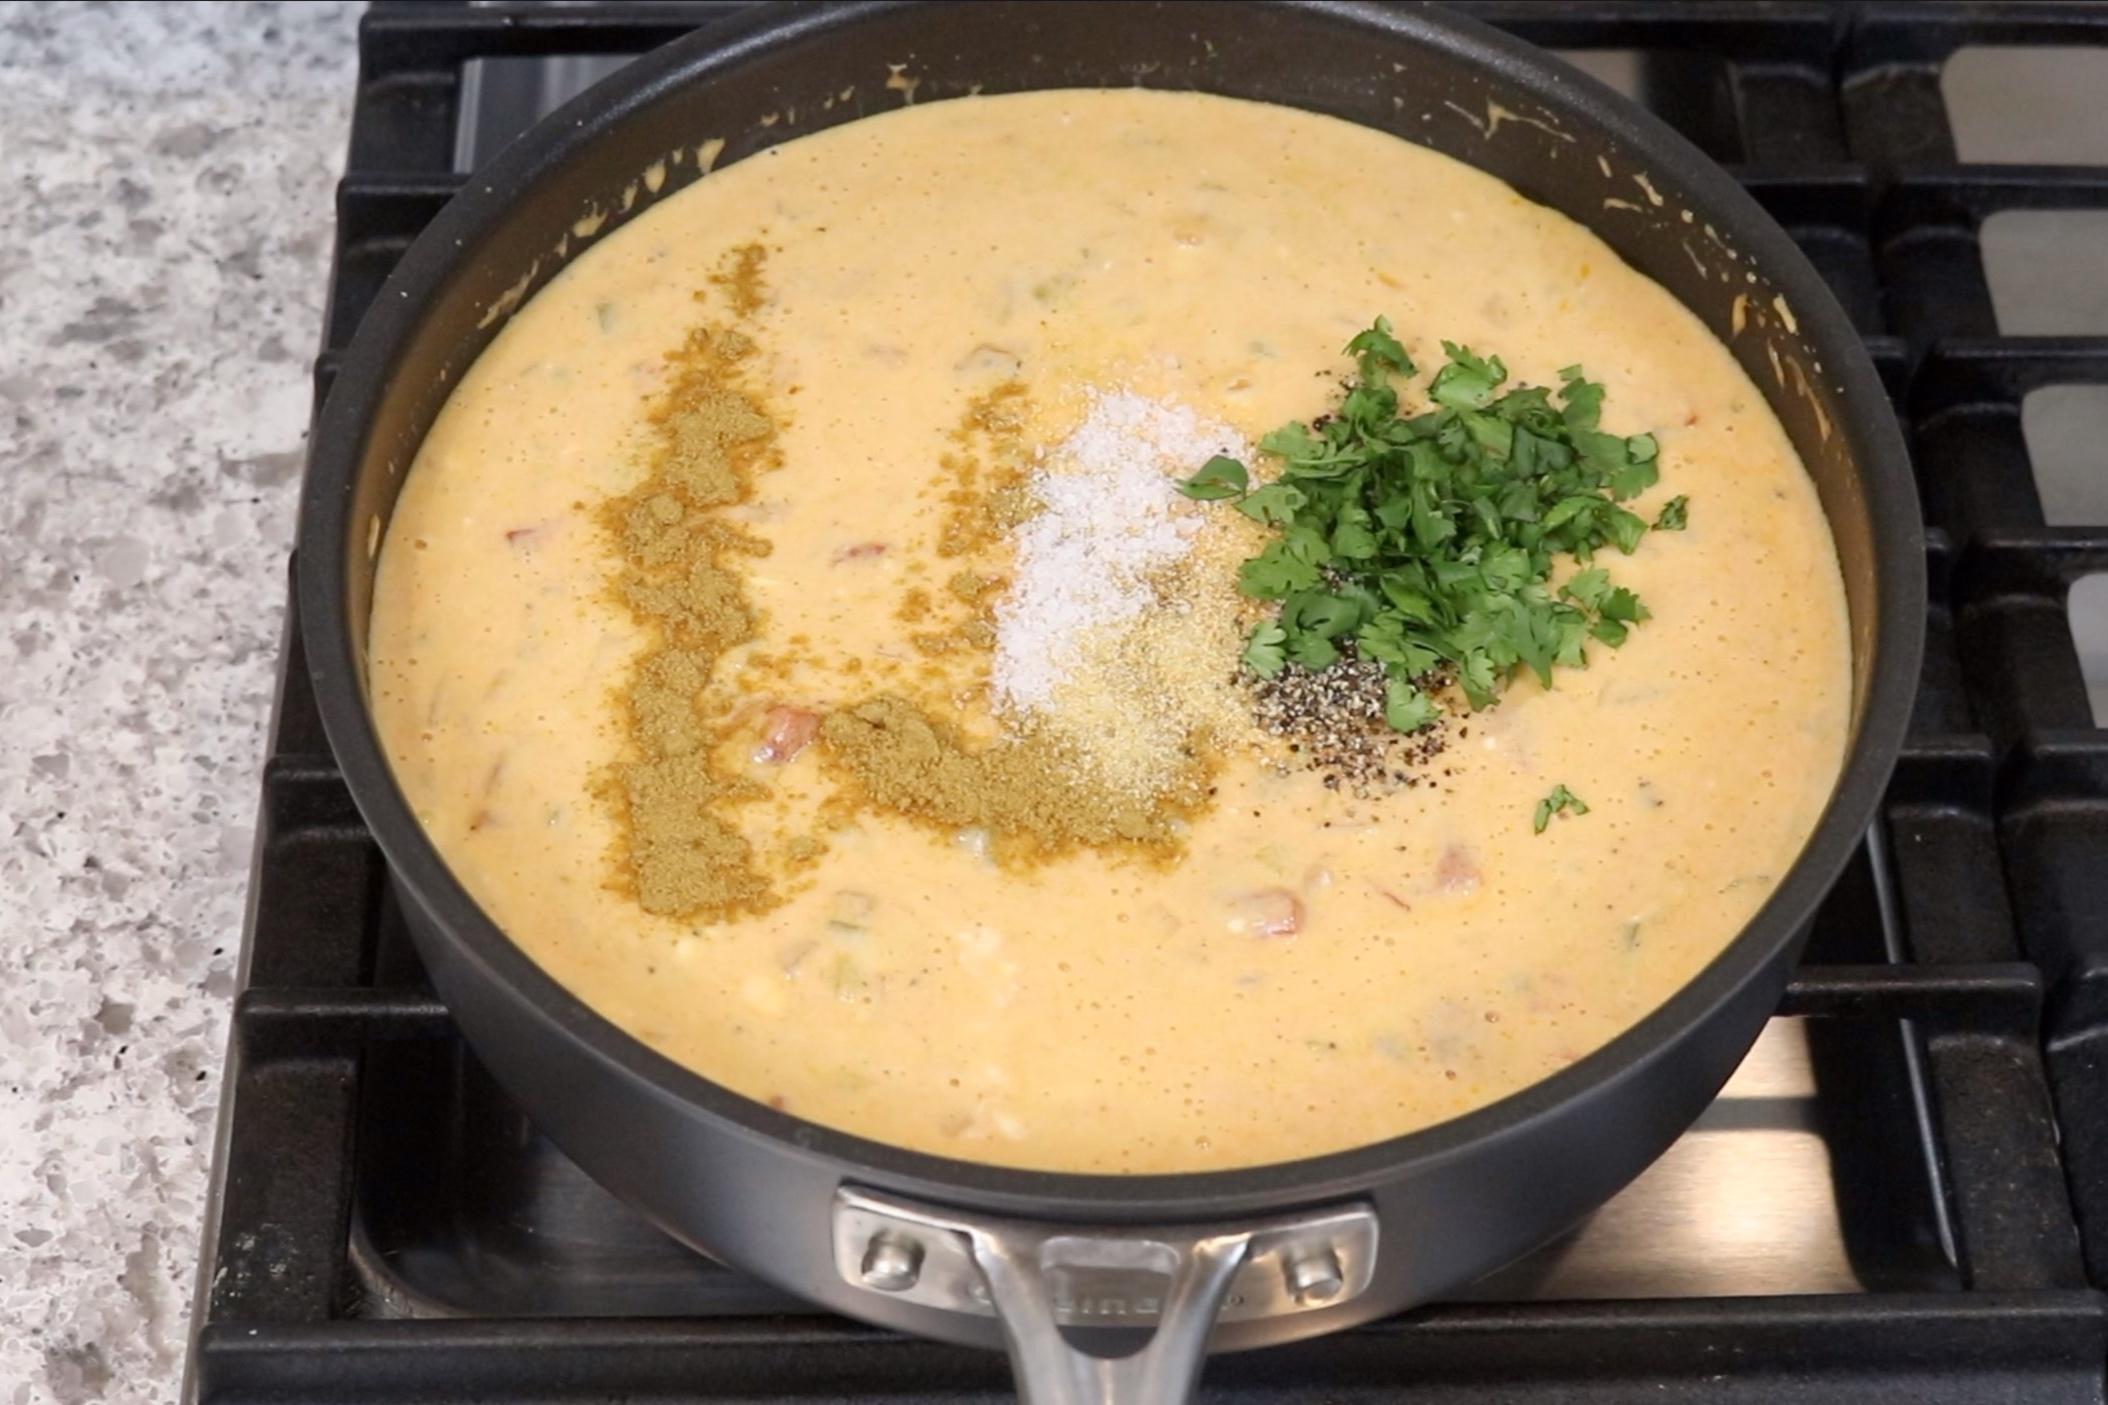 7. Add the cumin, onion powder, salt, pepper and cilantro. Stir to combine. -